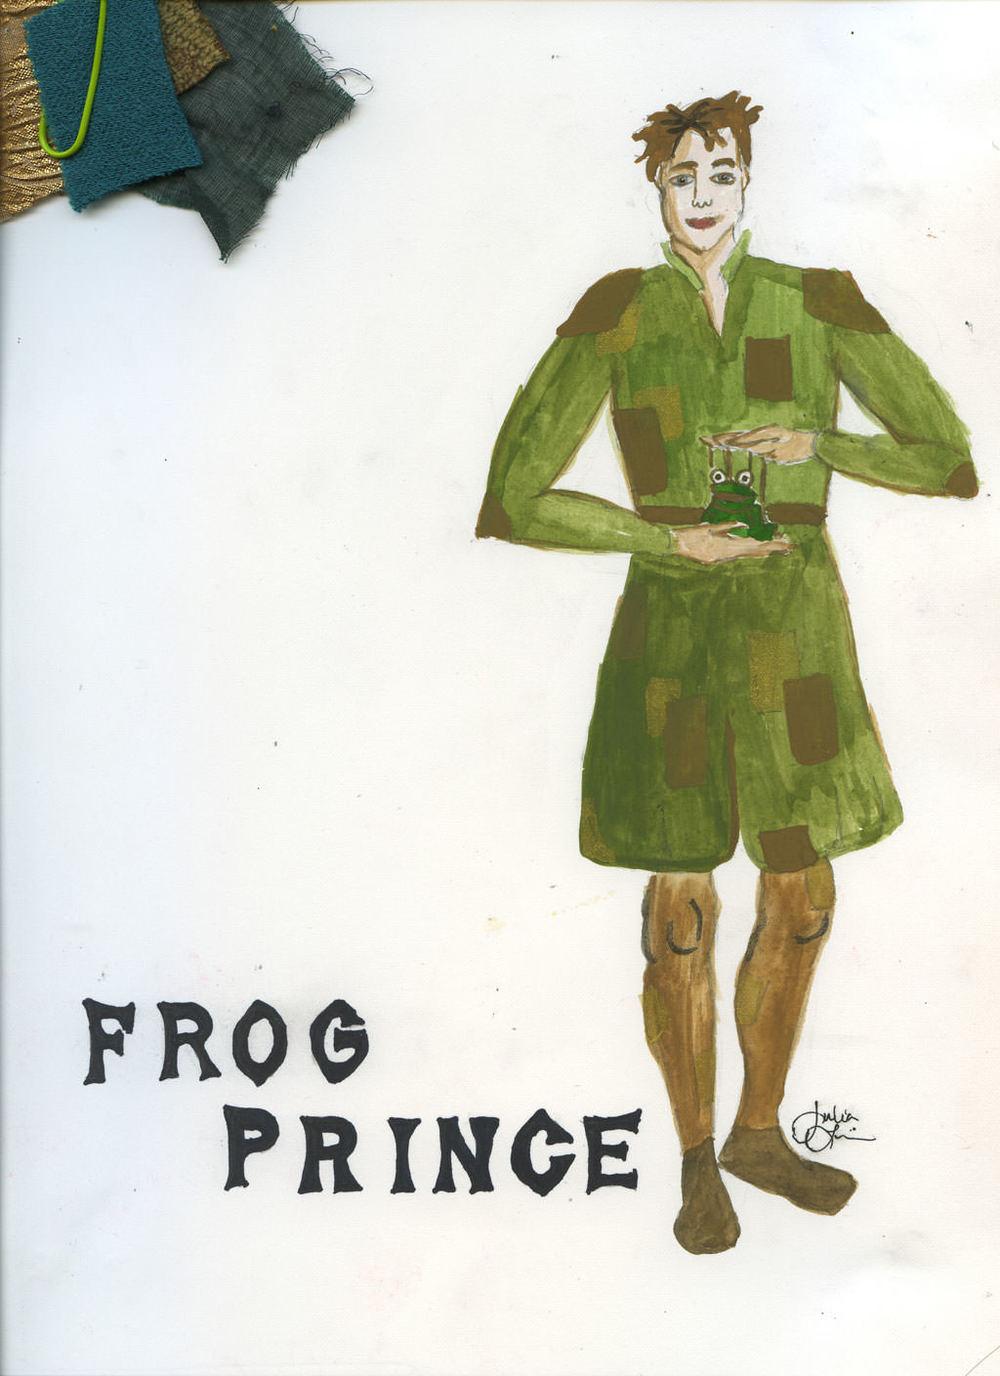 Frog-Prince copy.jpg